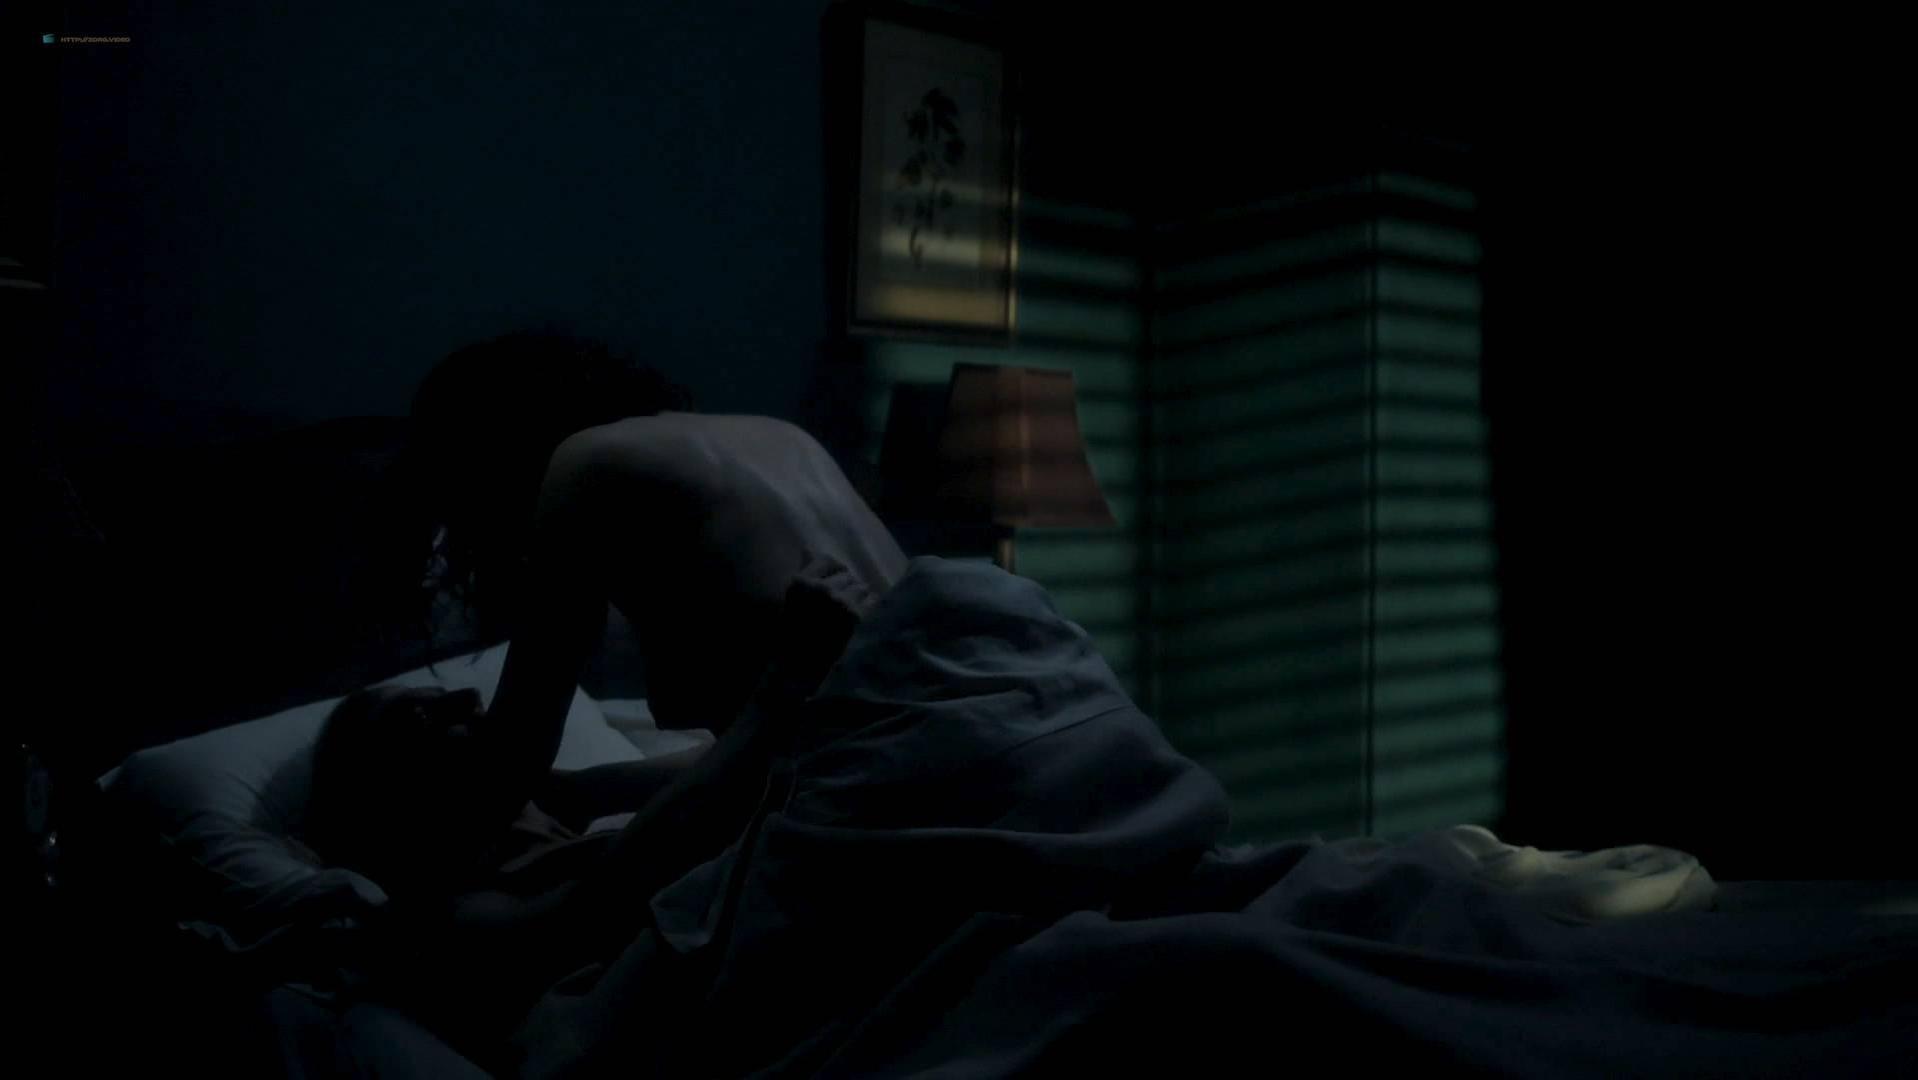 Caitriona Balfe nude - Outlander s03e02 (2017)